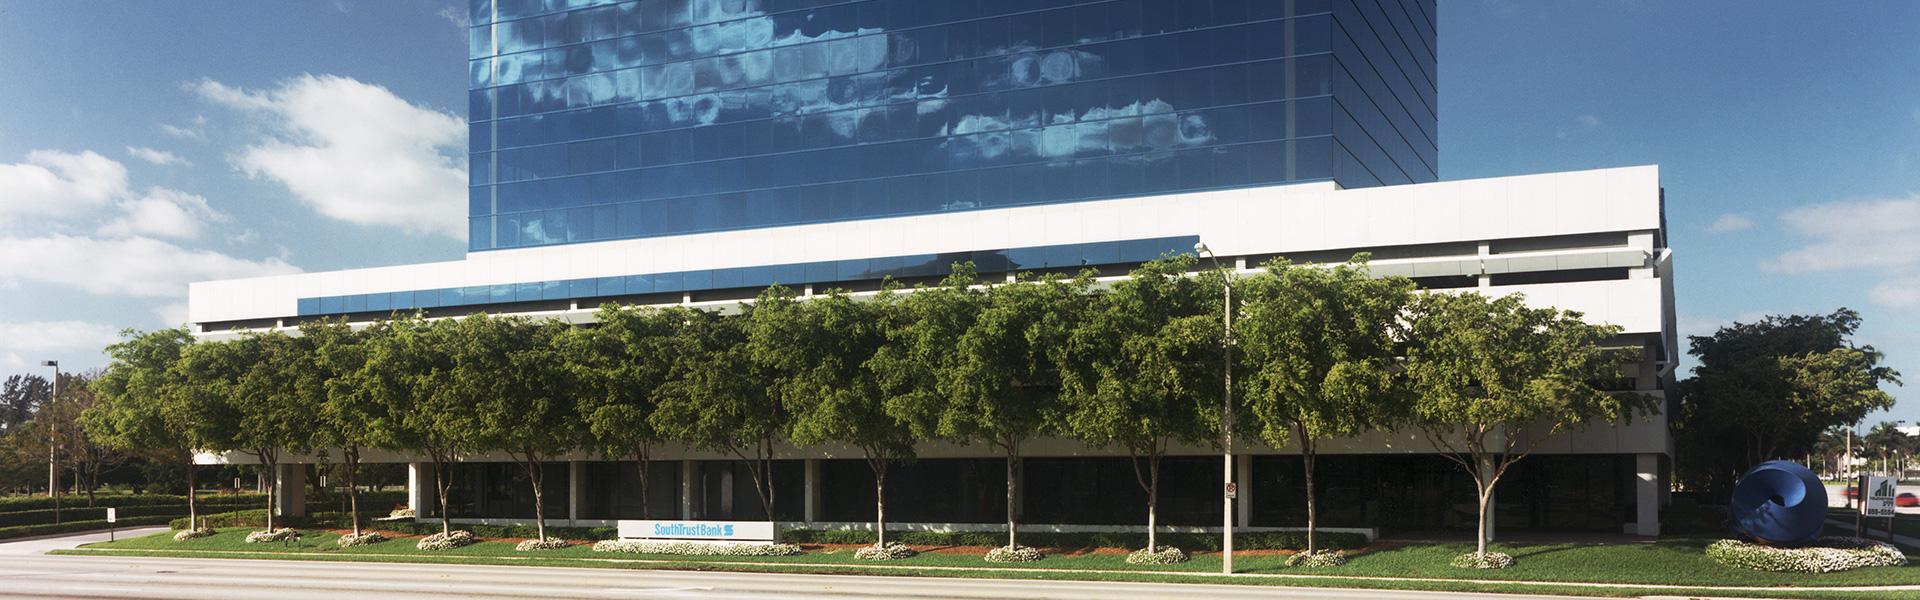 Property Management West Palm Beach Florida